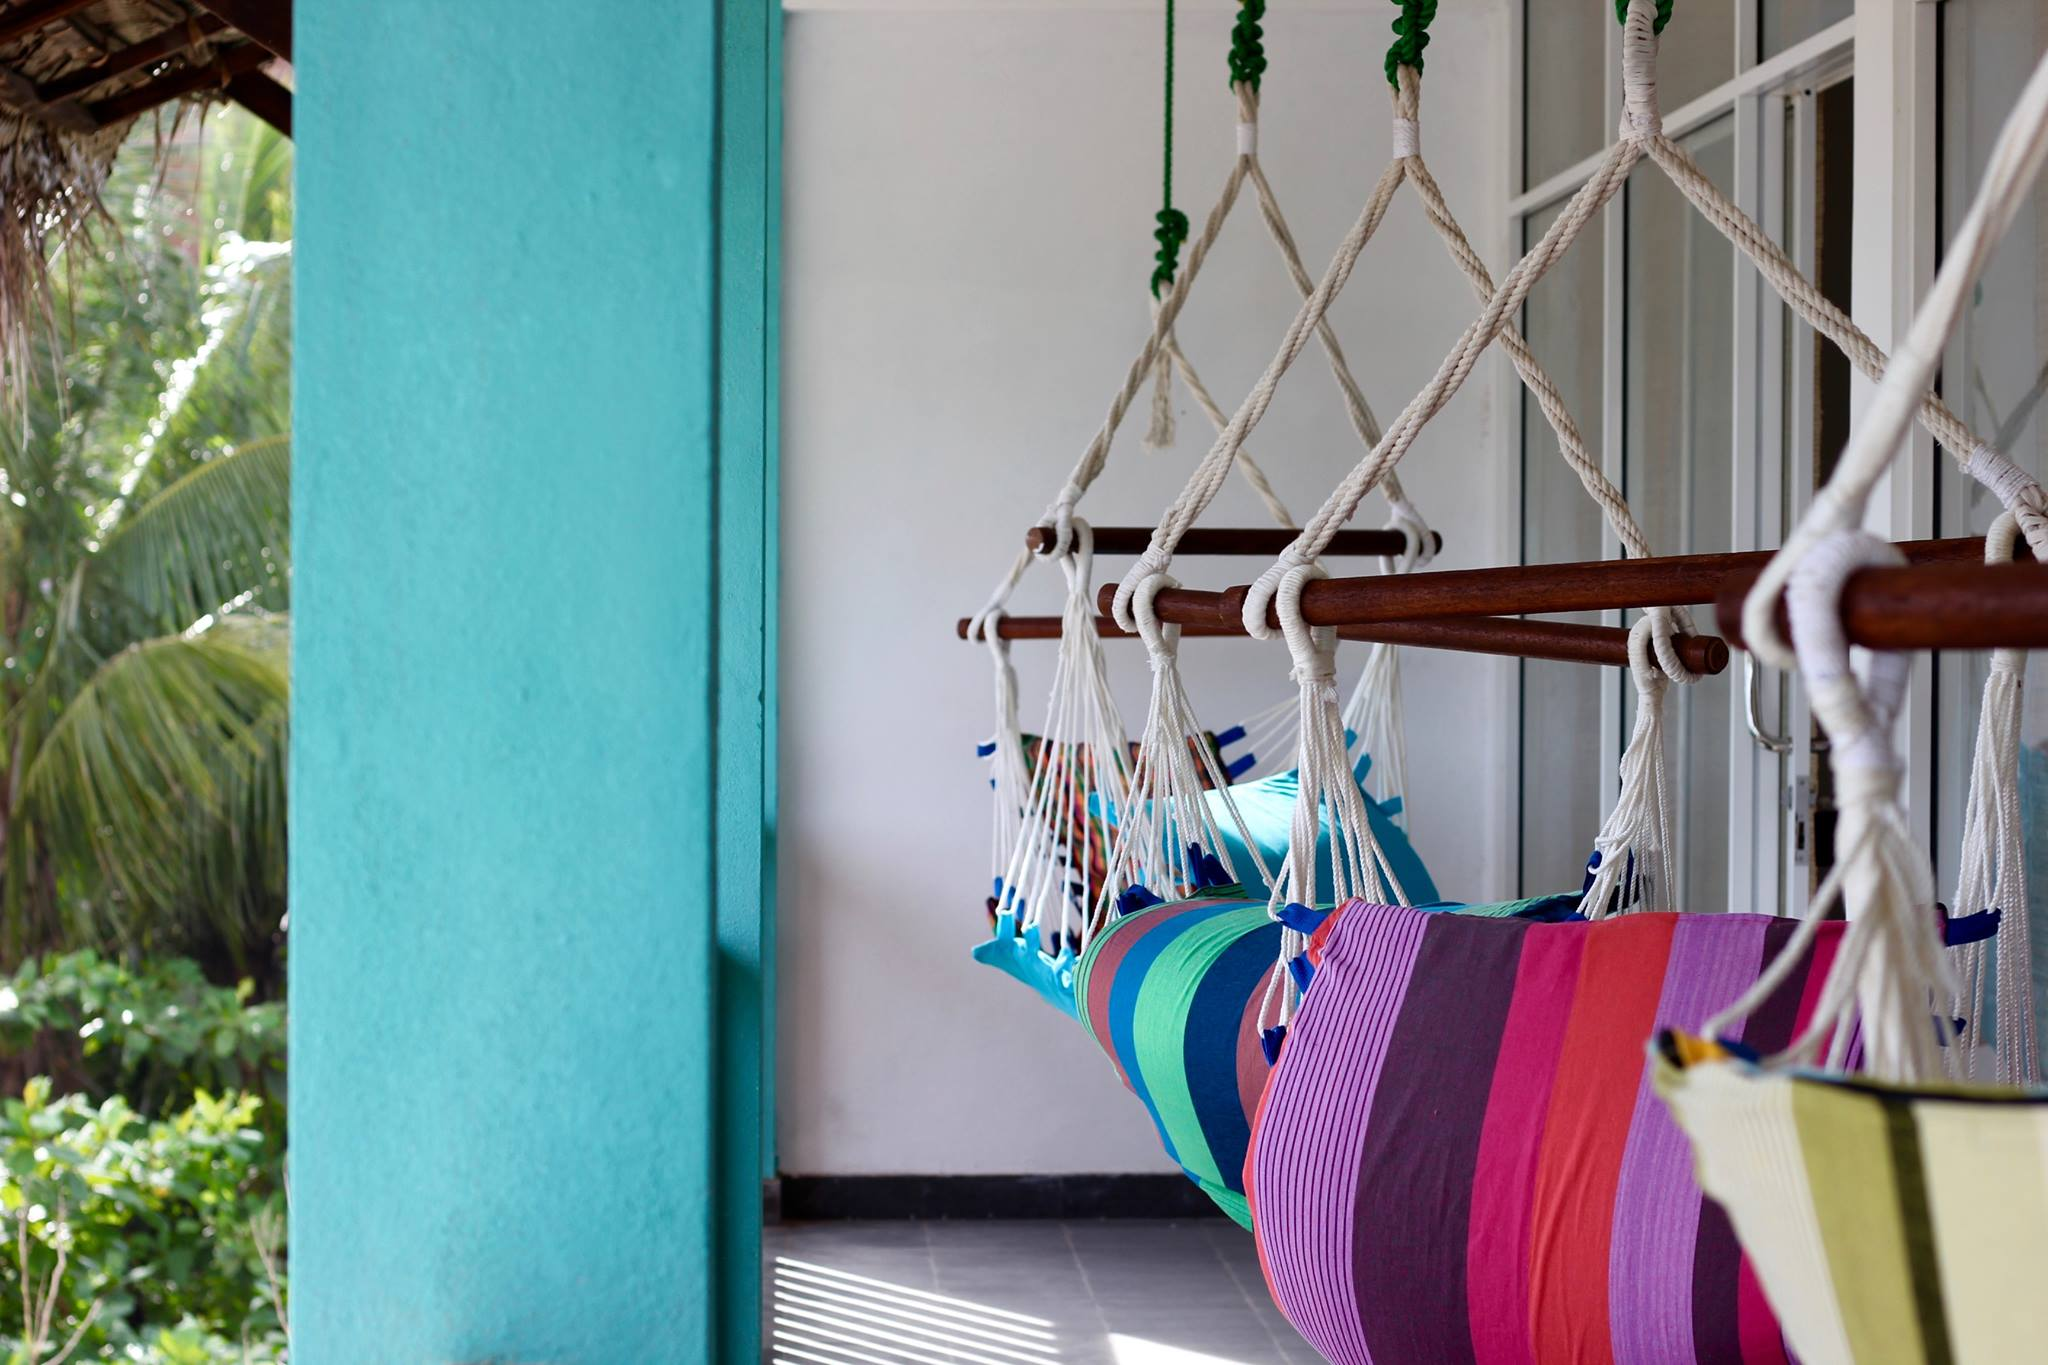 Hangtime - Accommodation - Dorm Room Balcony